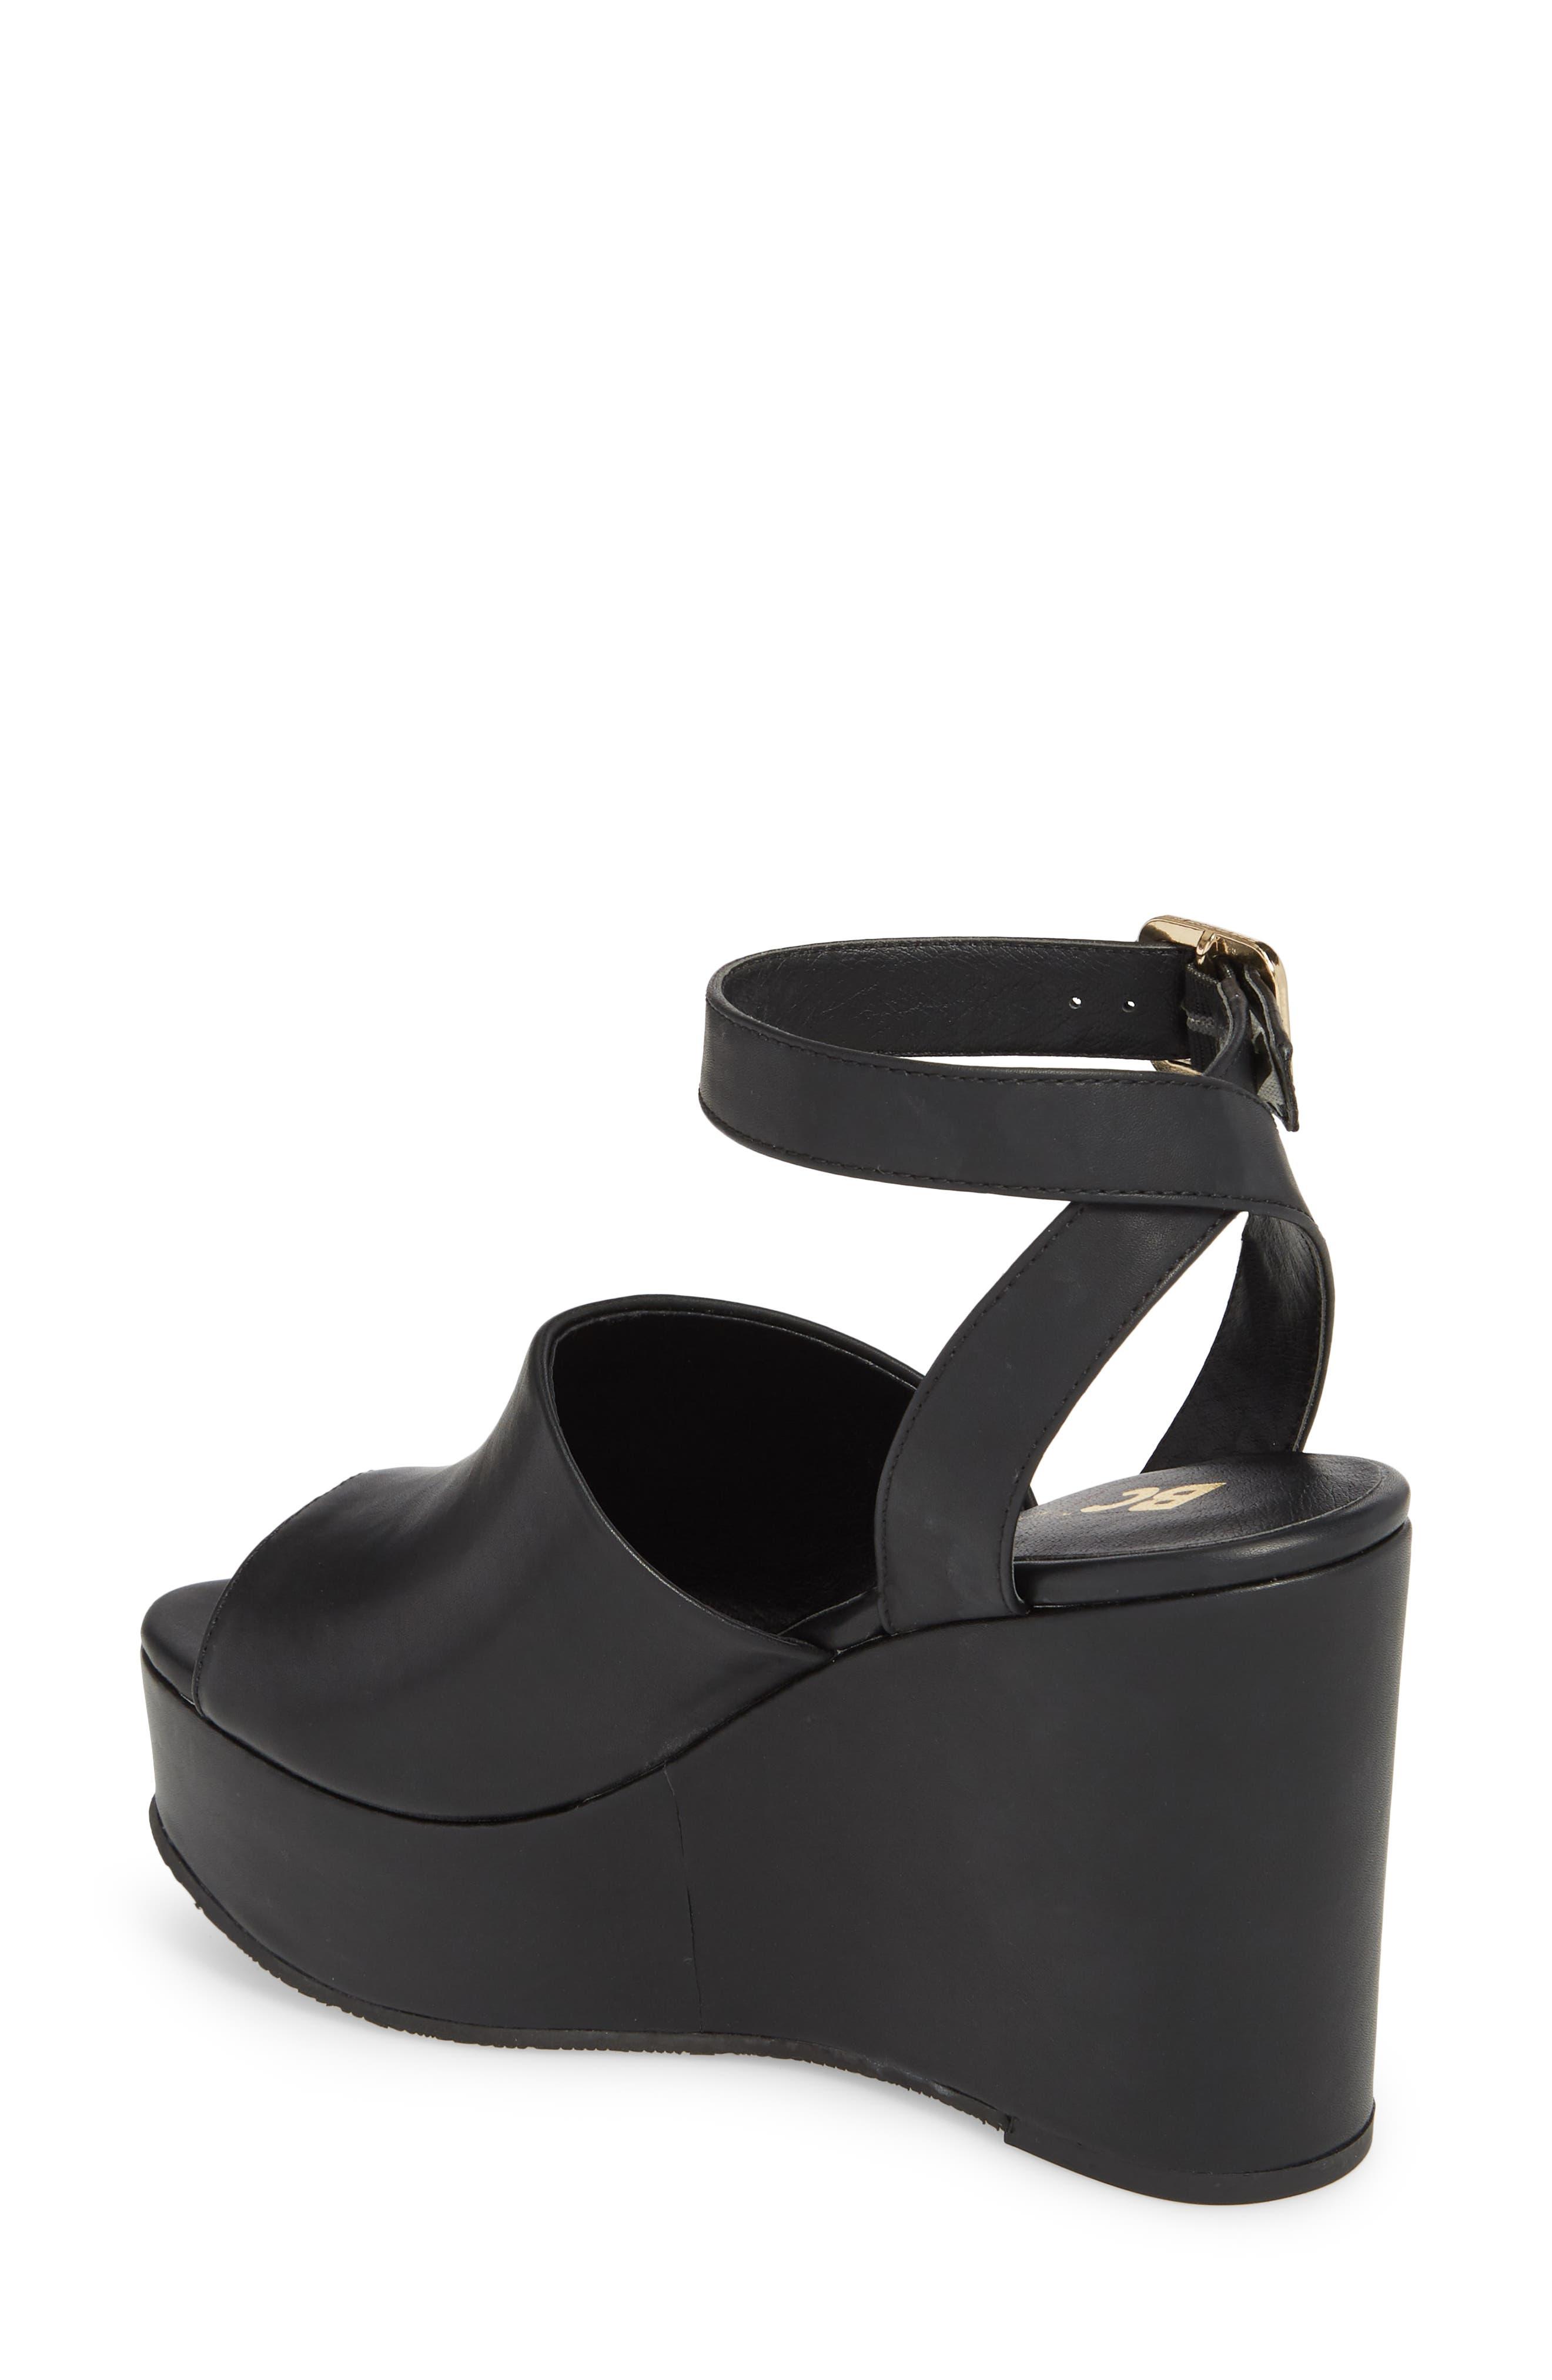 Admit One Platform Wedge Sandal,                             Alternate thumbnail 3, color,